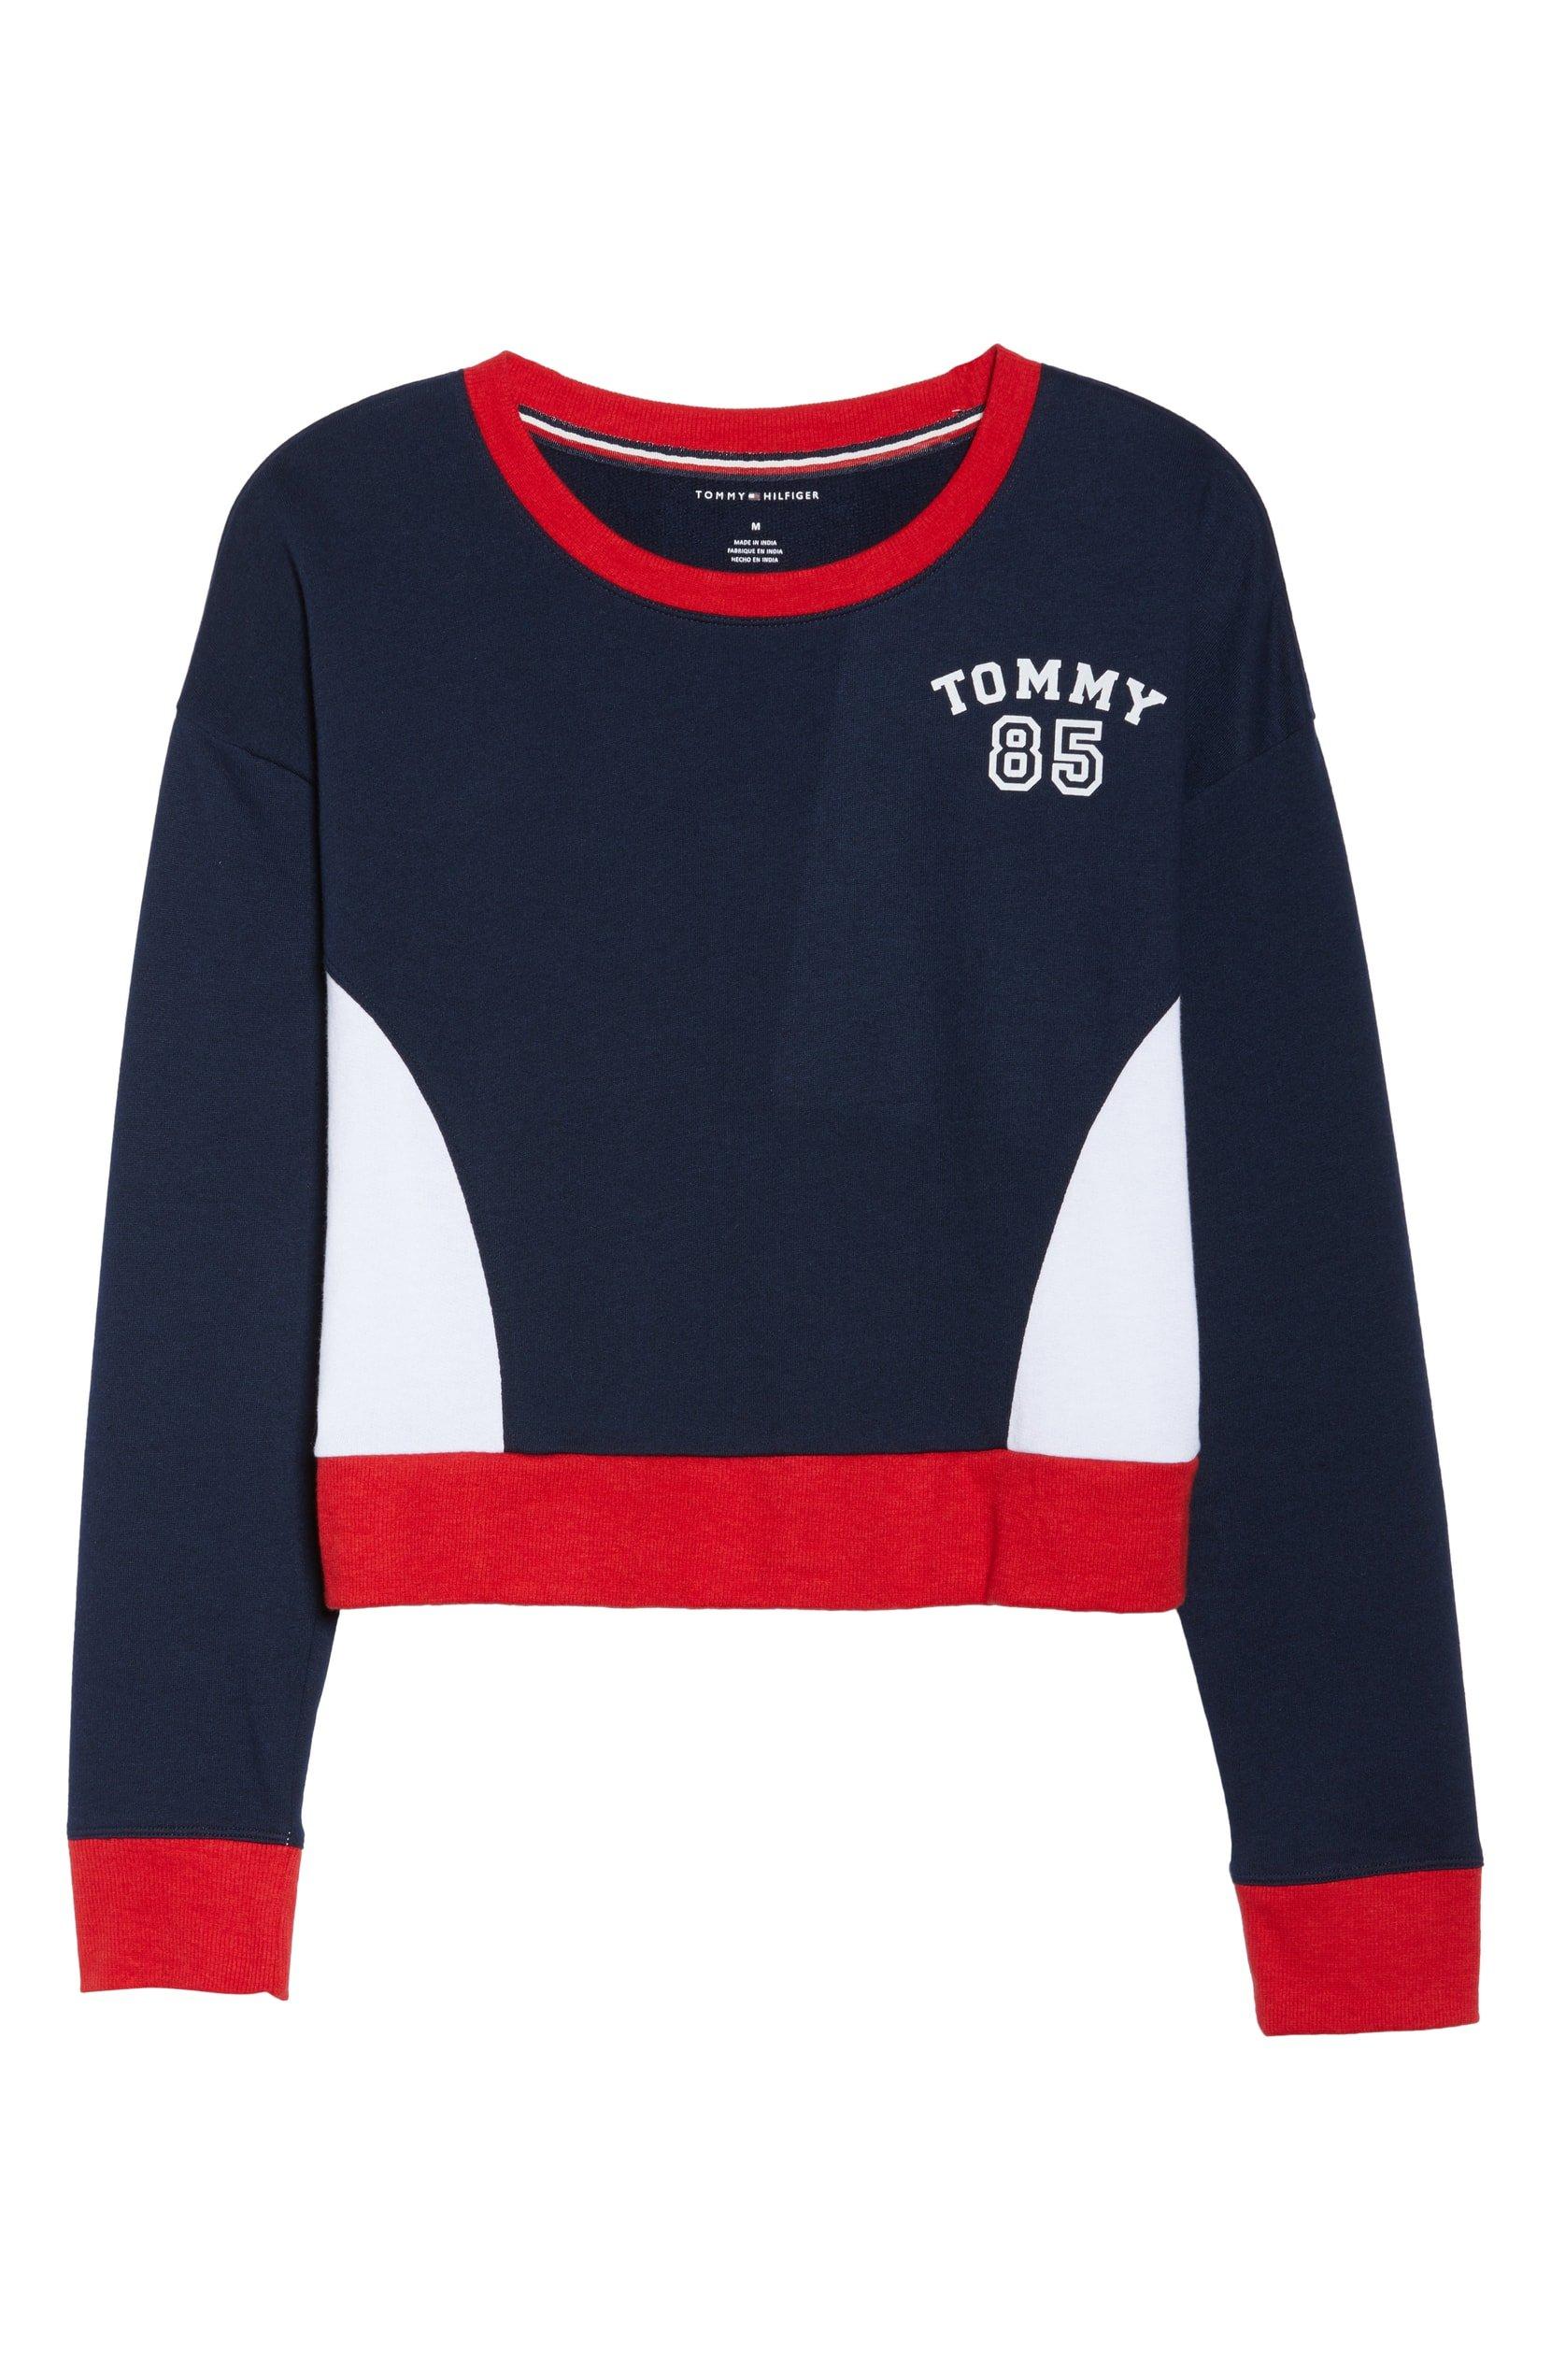 Tommy Hilfiger Women's Pullover Cropped Lounge Sweatshirt (Navy Blazer, Small)